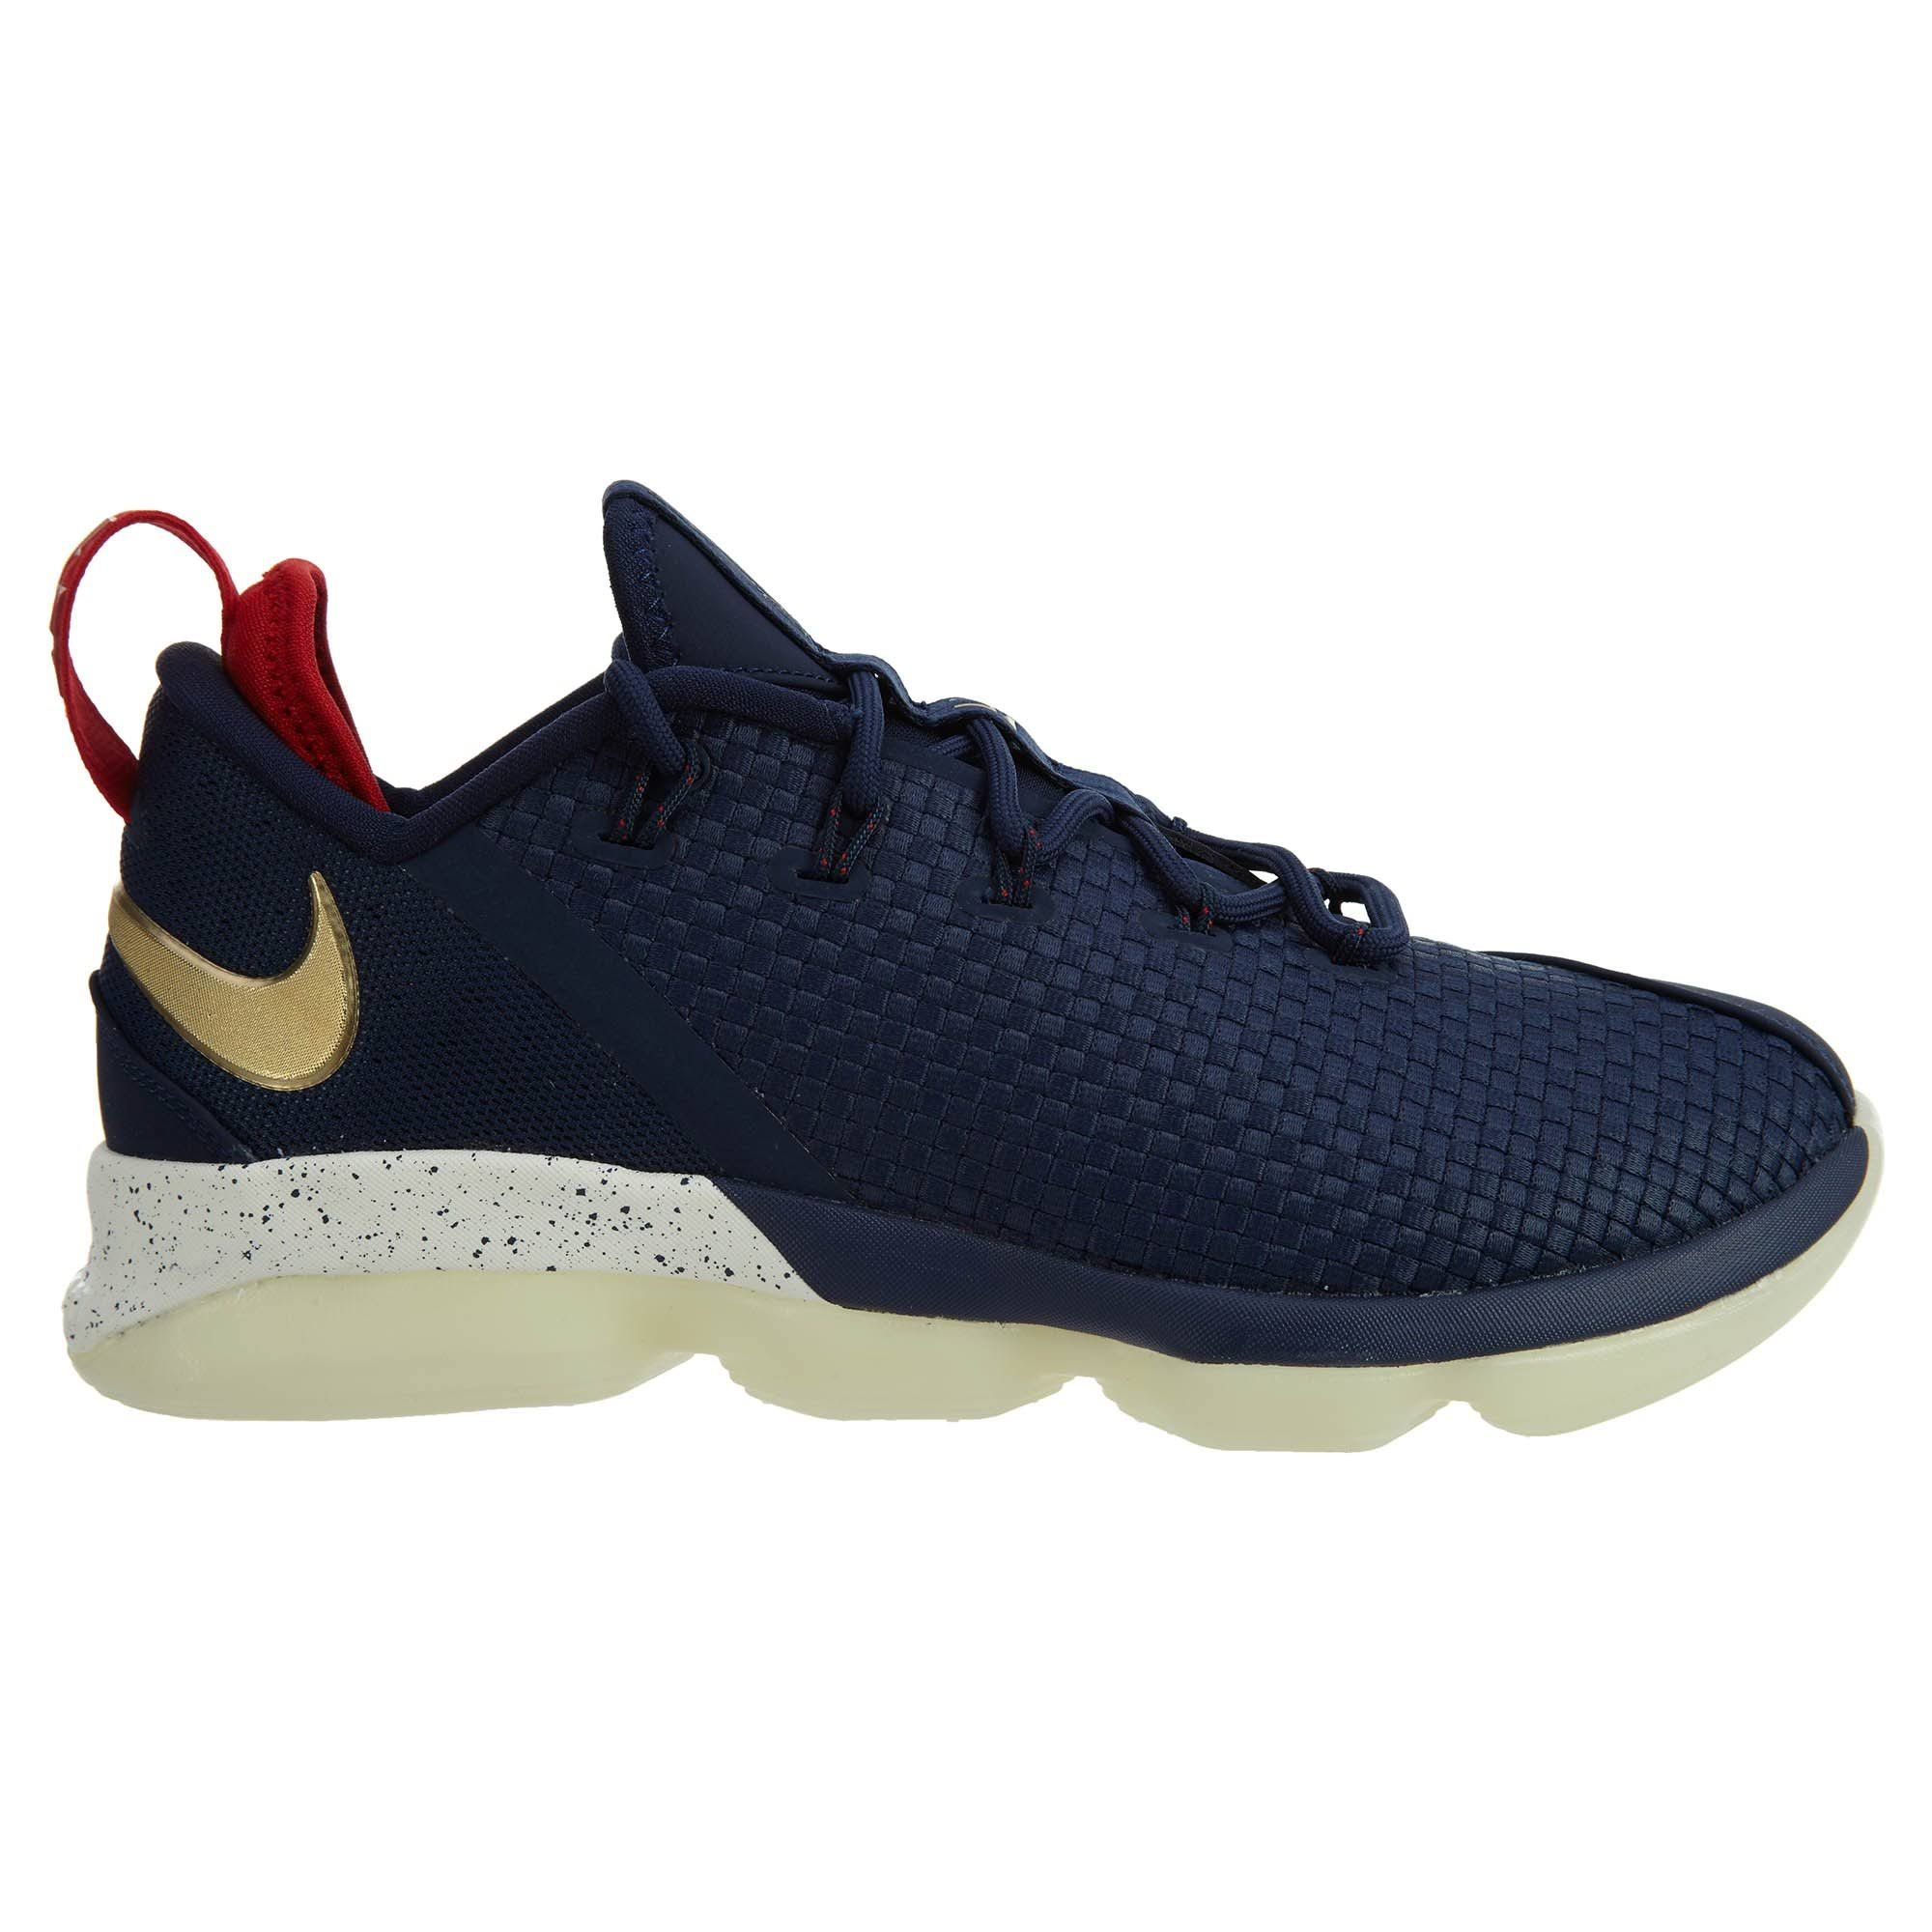 9 Para Estilo Medianoche Dorado Lebron 878636 Hombre Tamaño Xiv Low Nike Metálico qwU8Xn